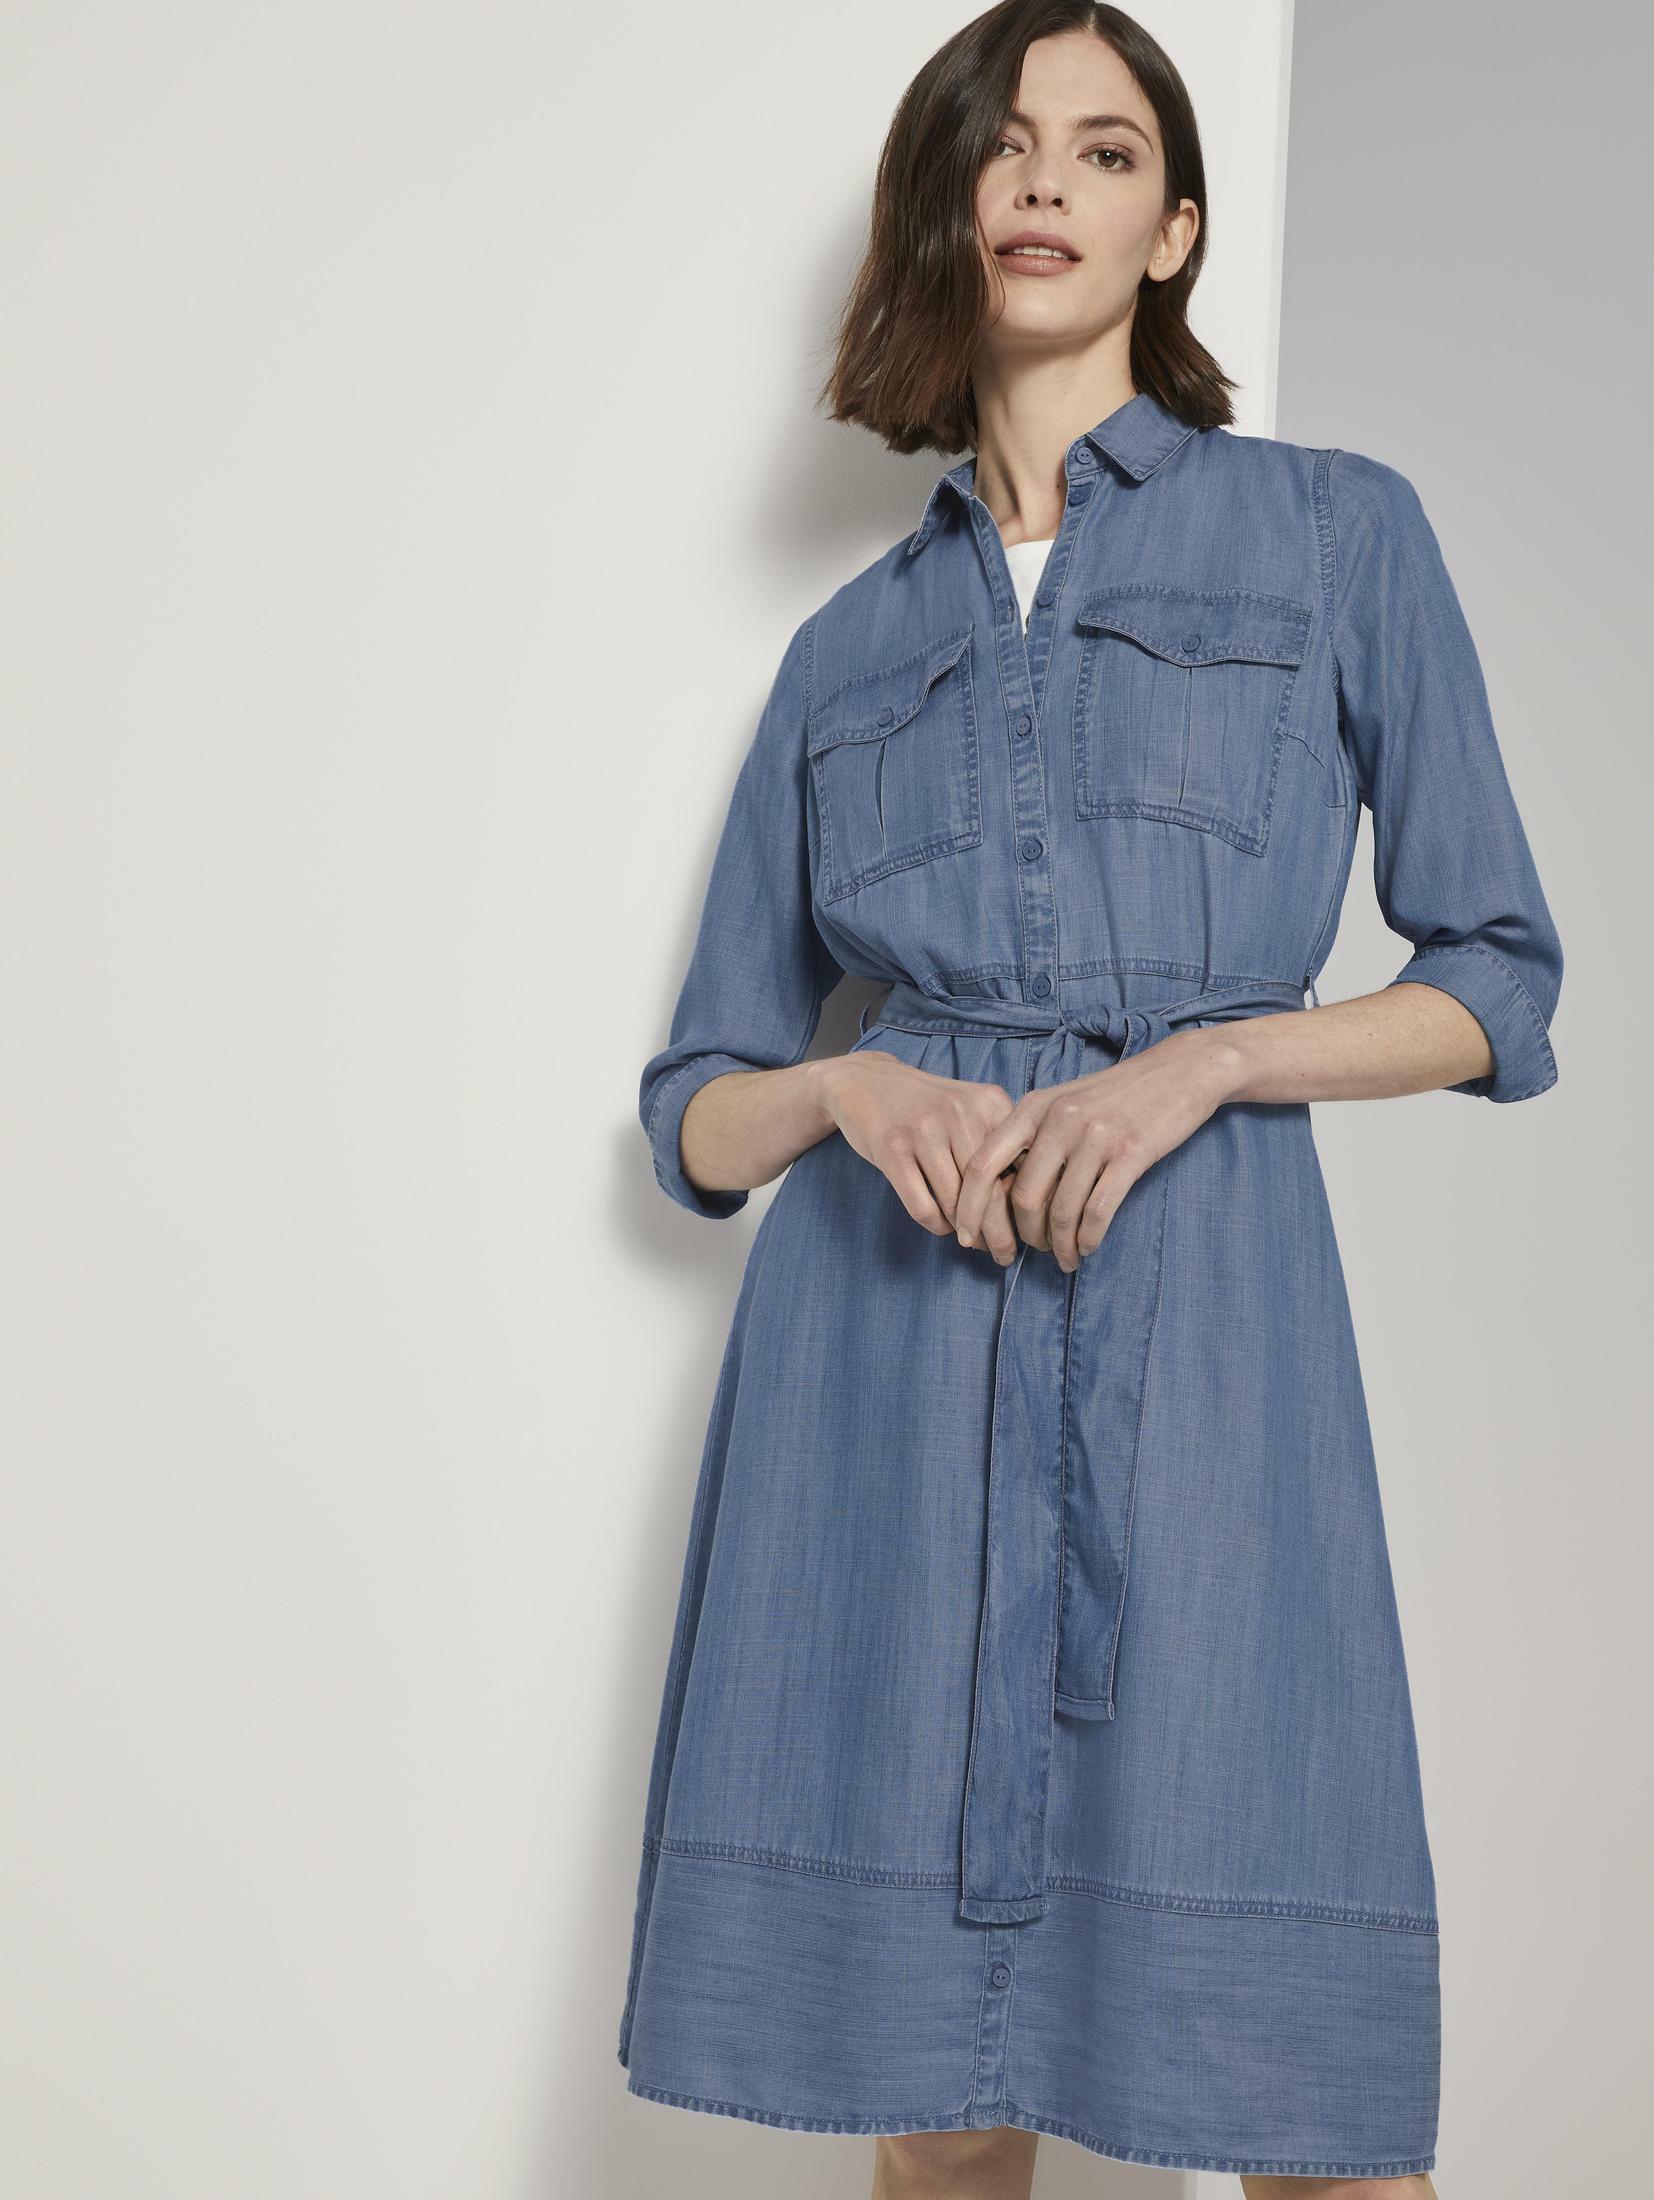 tom tailor -  Jeanskleid Denim Kleid im Shirt-Style